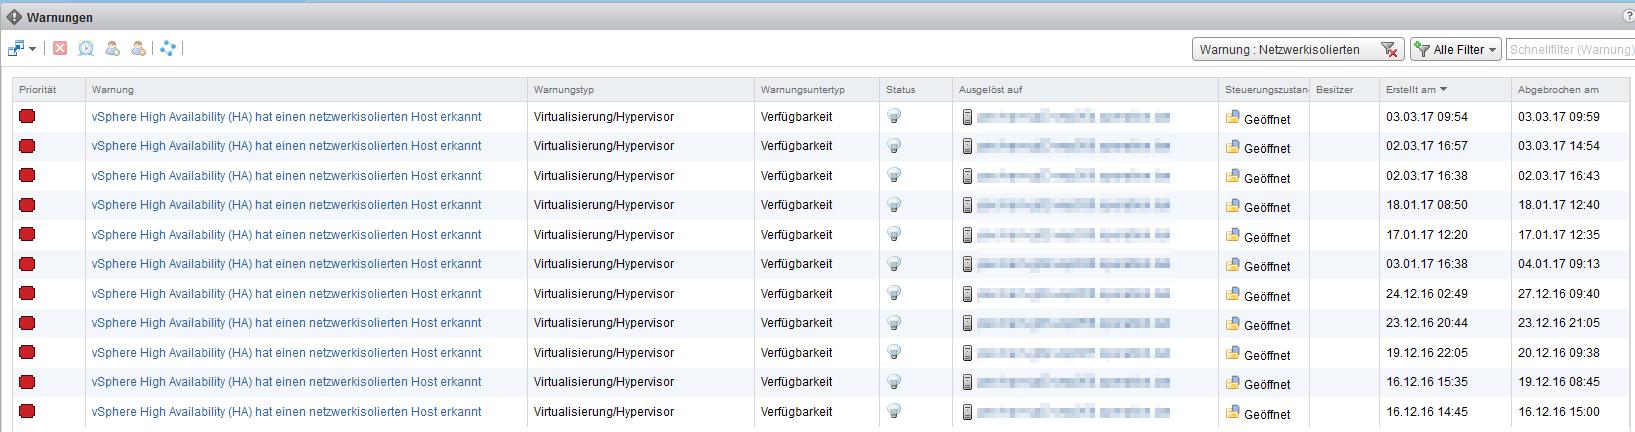 vRealize Operations Manager - Warnungen - vSphere HA isolation Events